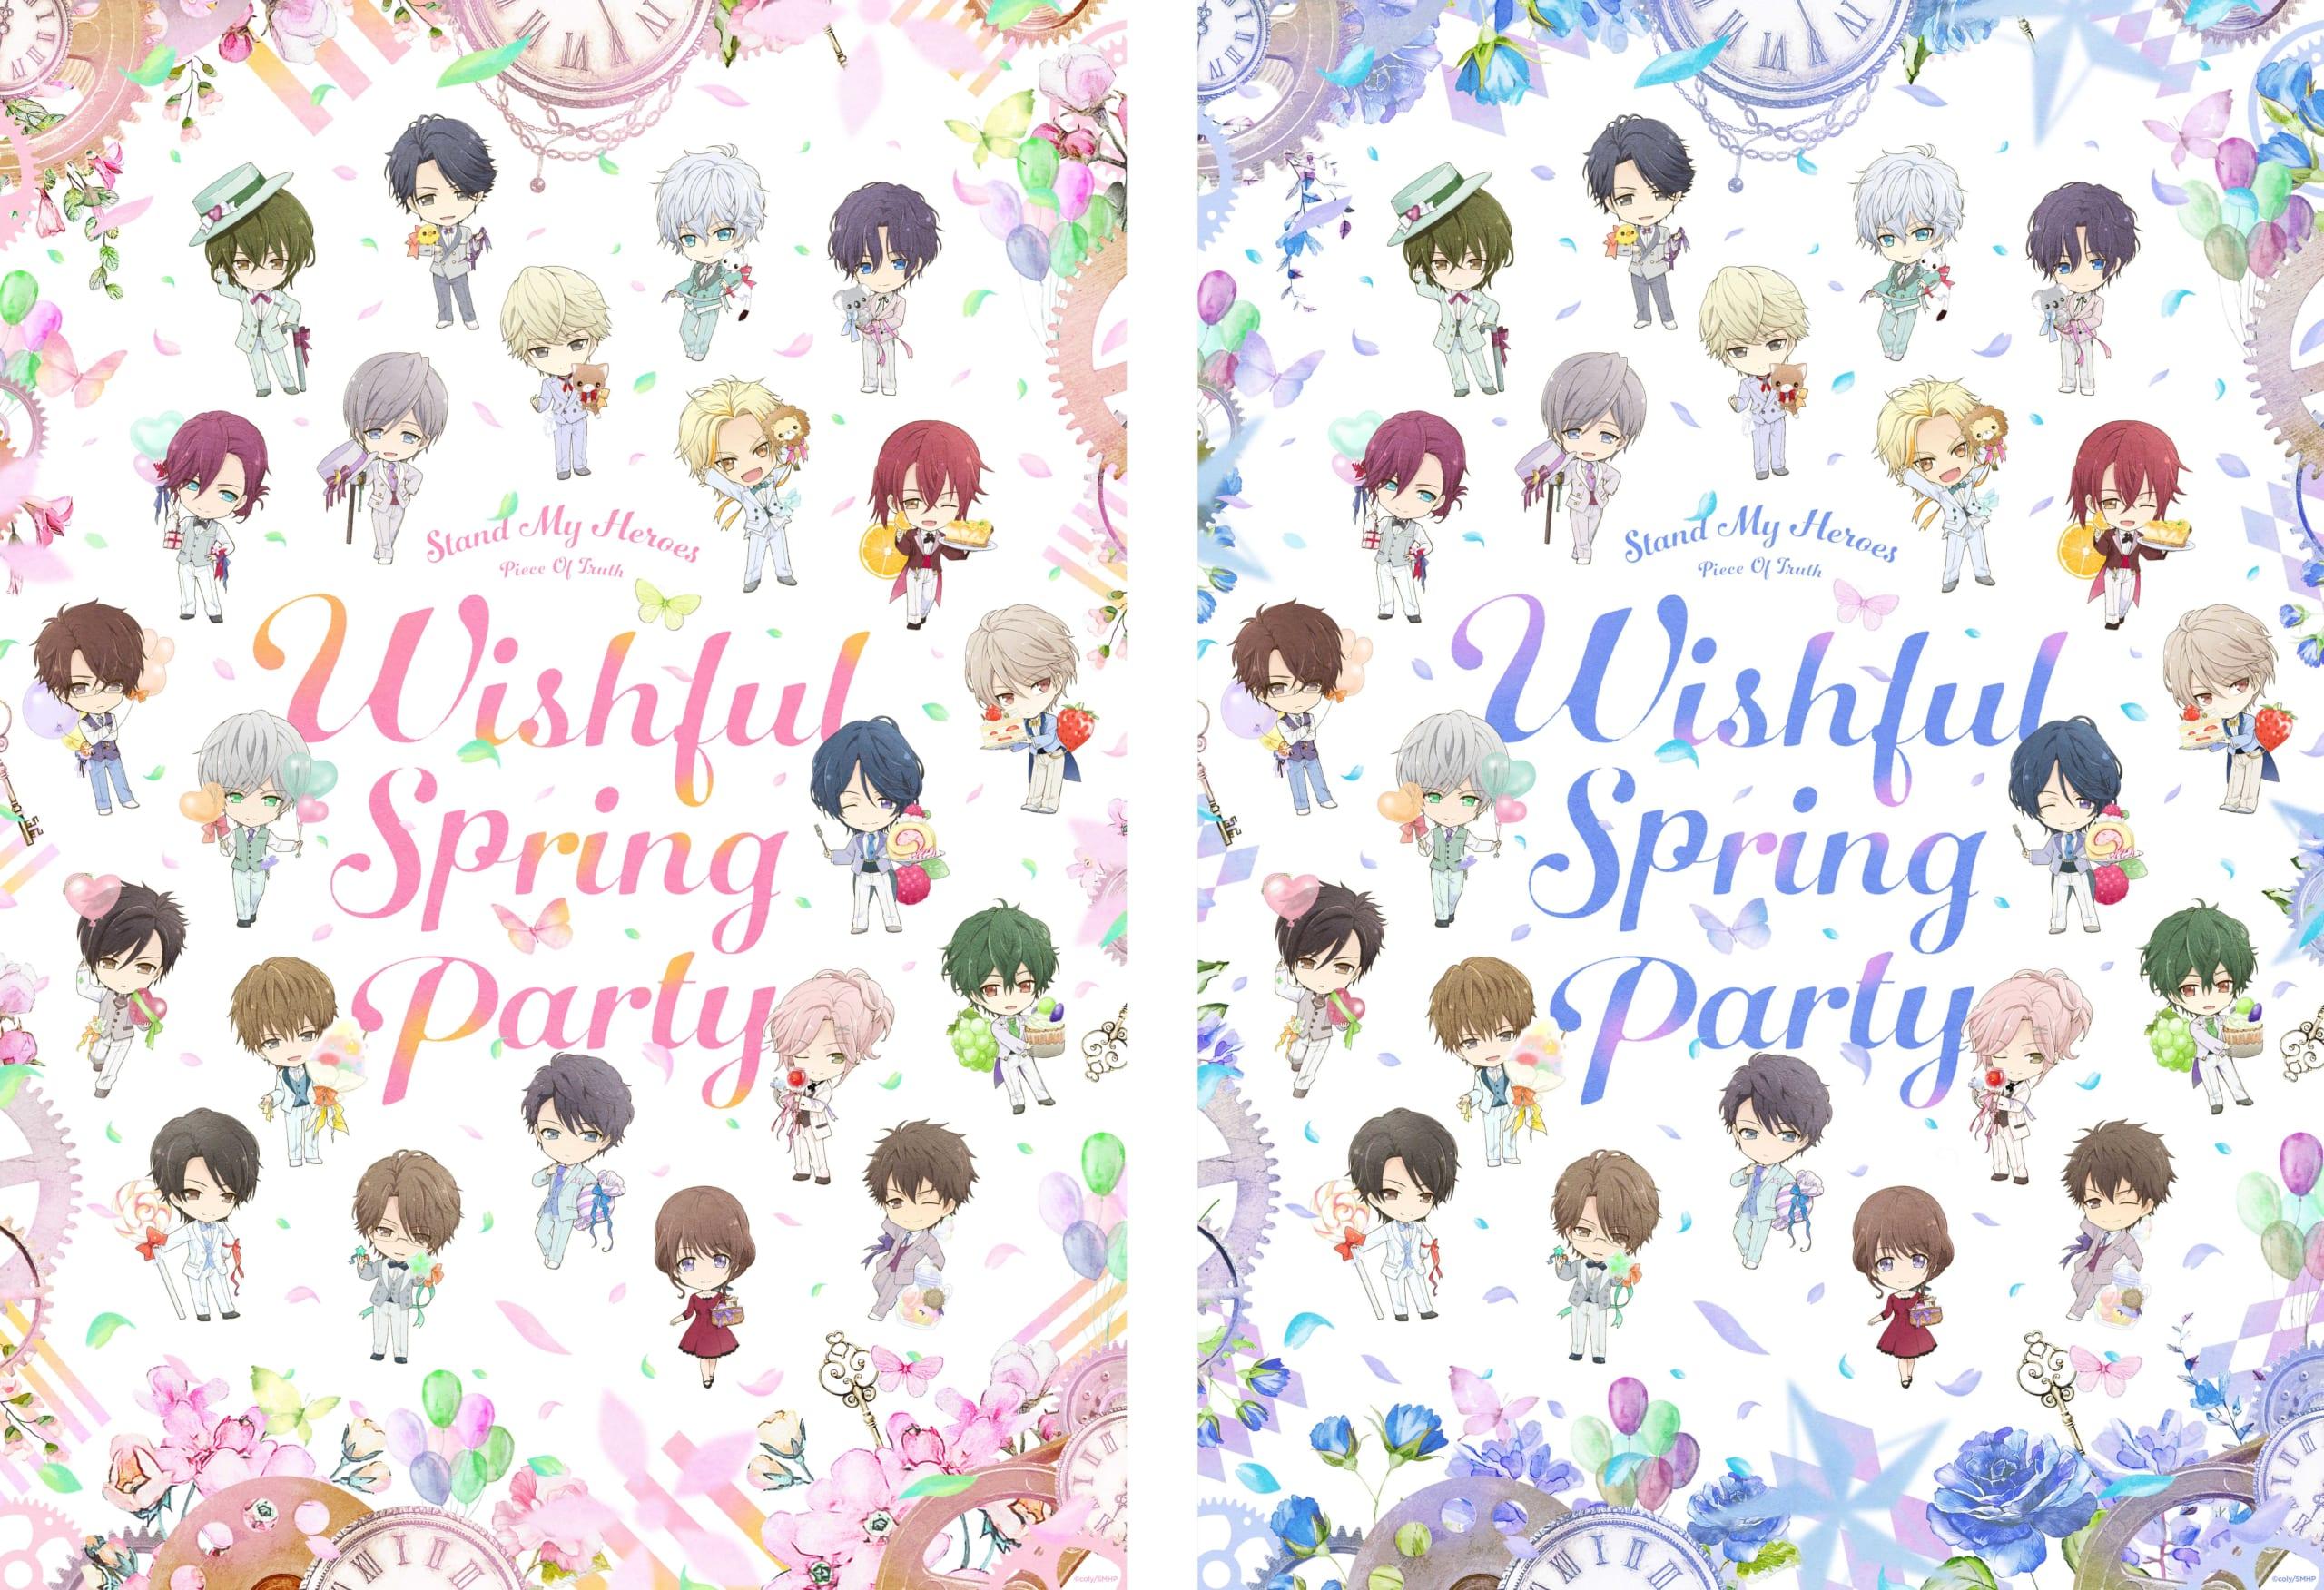 TVアニメ「スタマイ」プレミアムイベント「Wishful Spring Party」オンラインで開催決定!ビジュアルも解禁